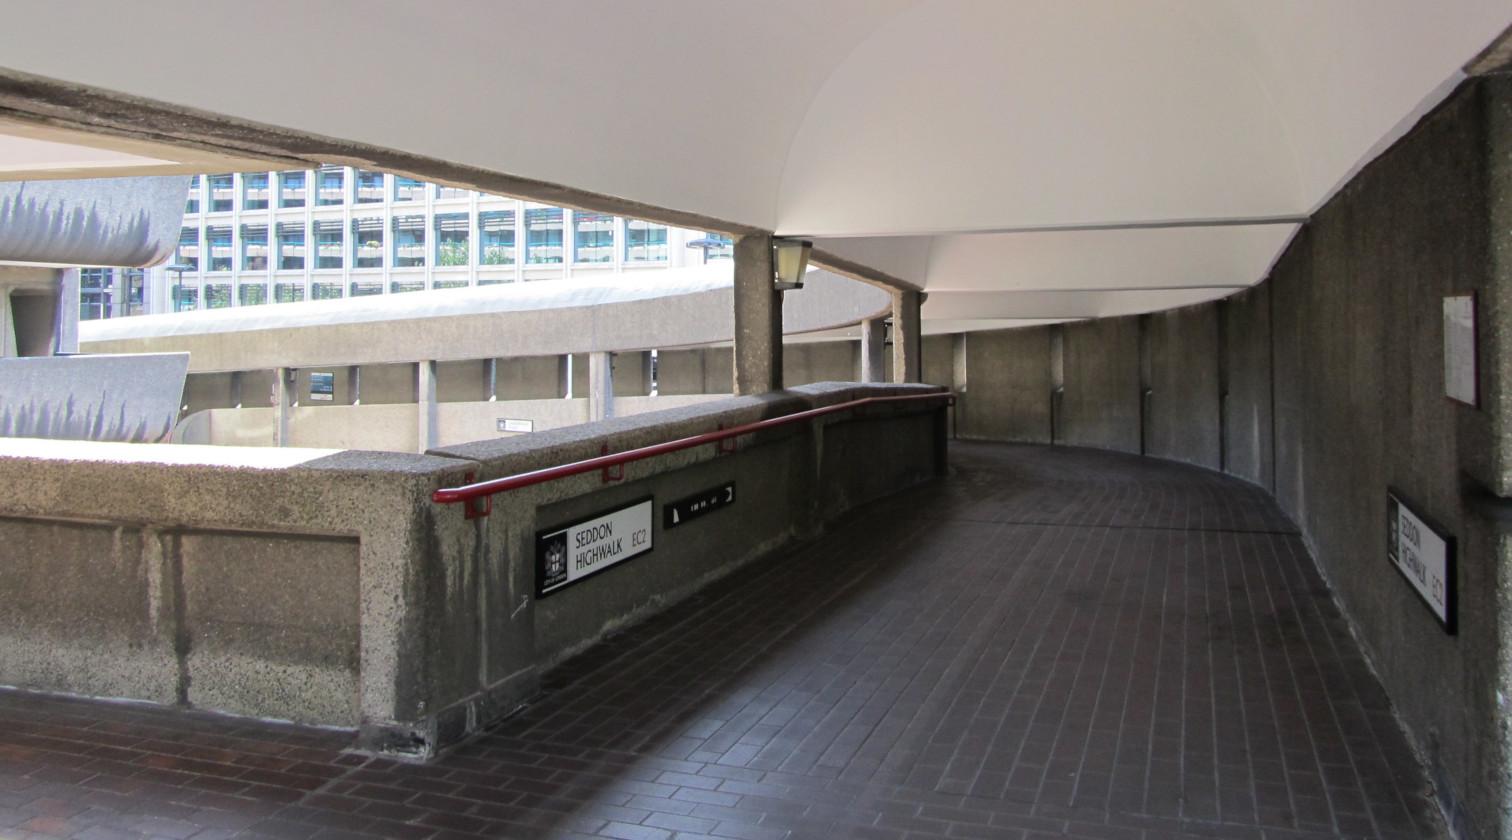 Seddon Highwalk in the Barbican Estate